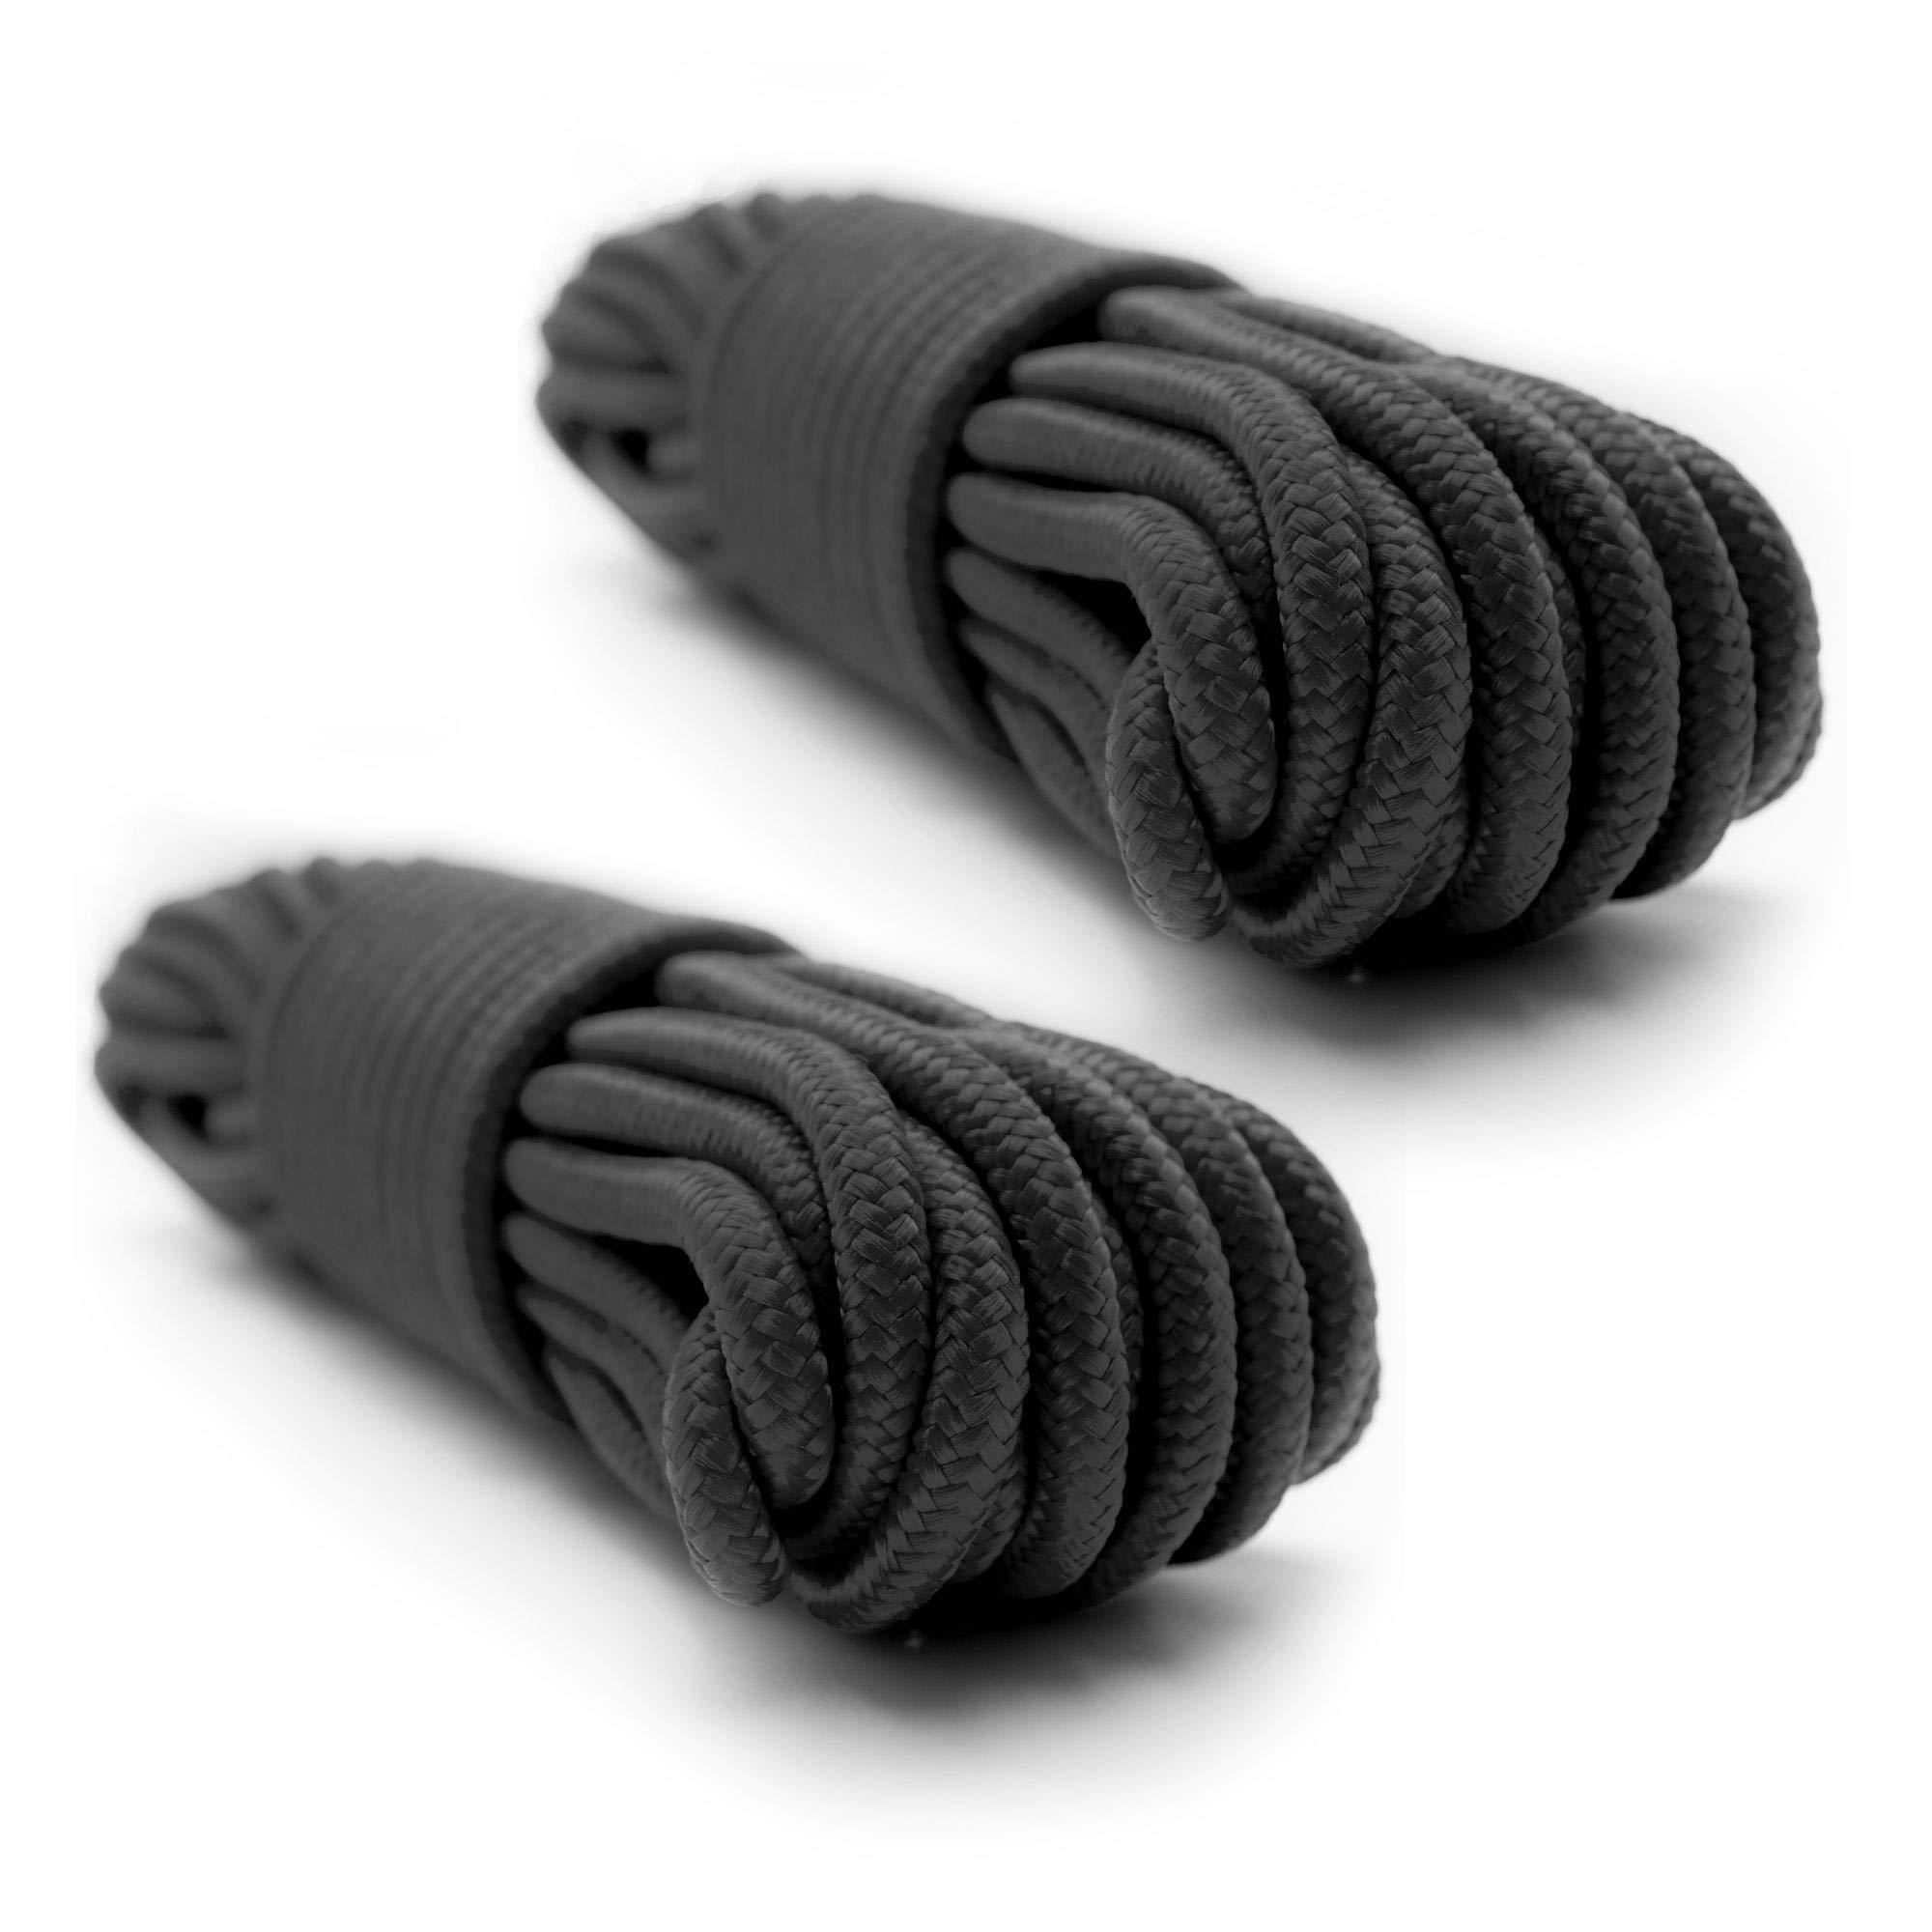 Emergency Zone 9mm (3/8 inch) Nylon Braided, 50 Foot, Multi-Purpose Rope. Black 2 Pack